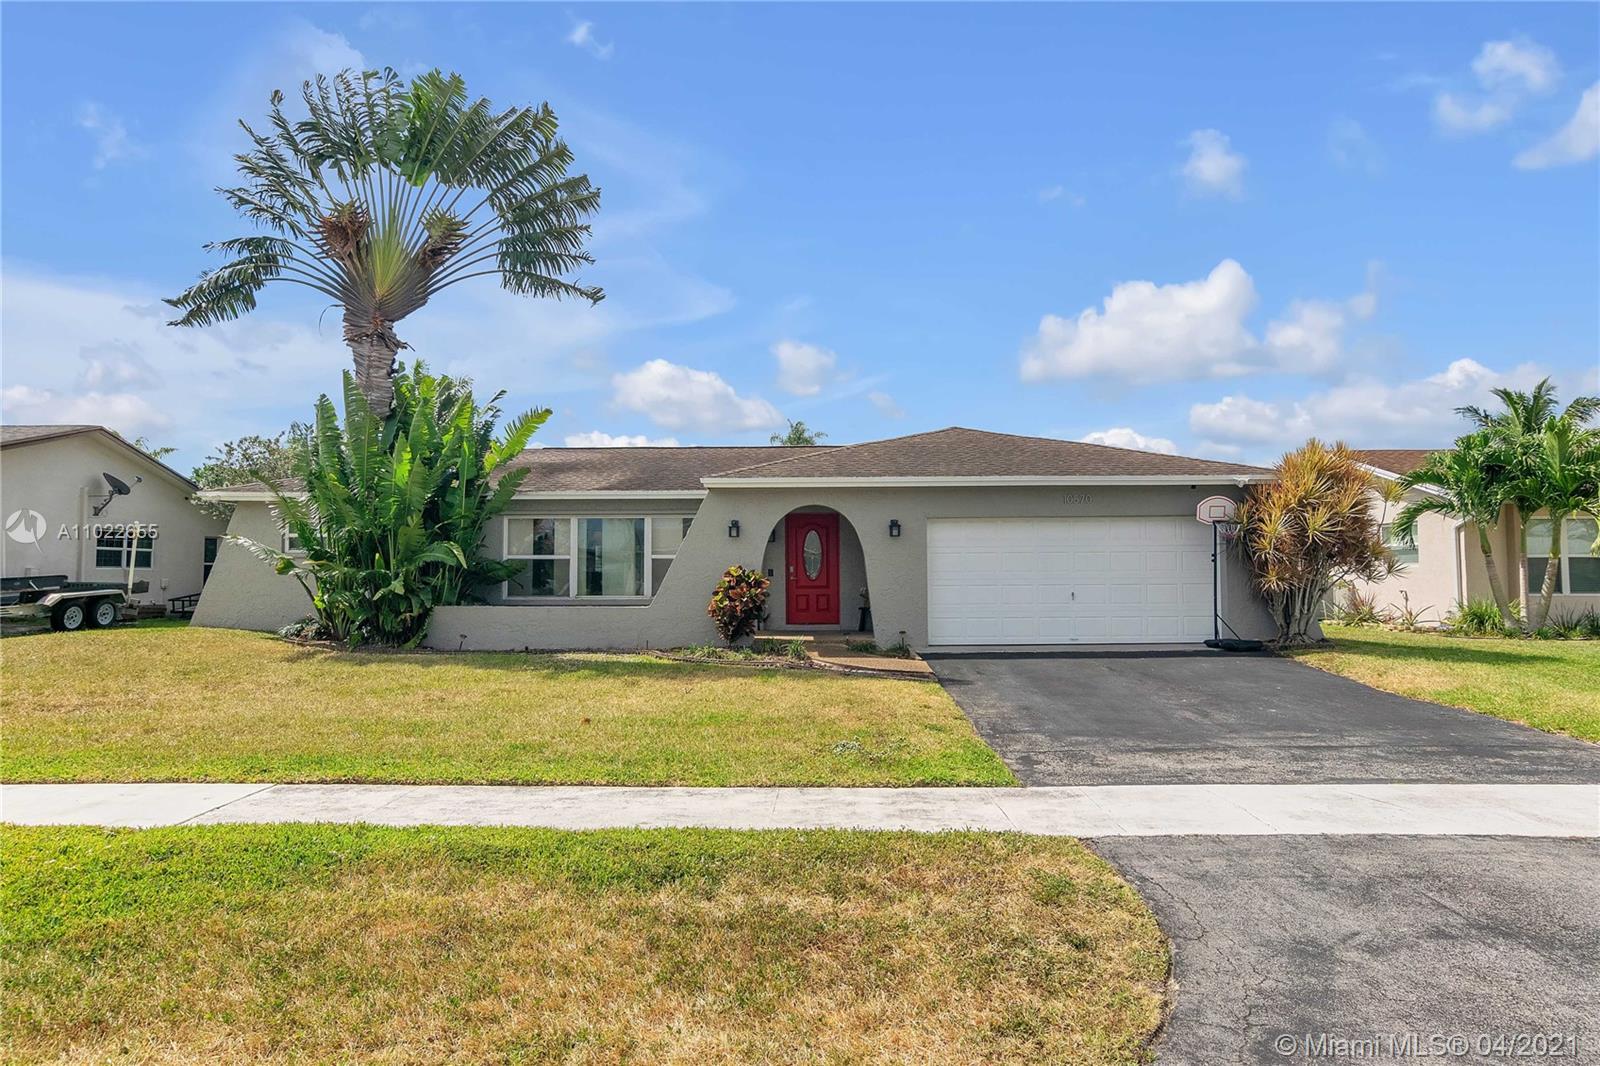 Millers Sunrise Estates - 10570 NW 21st Ct, Sunrise, FL 33322